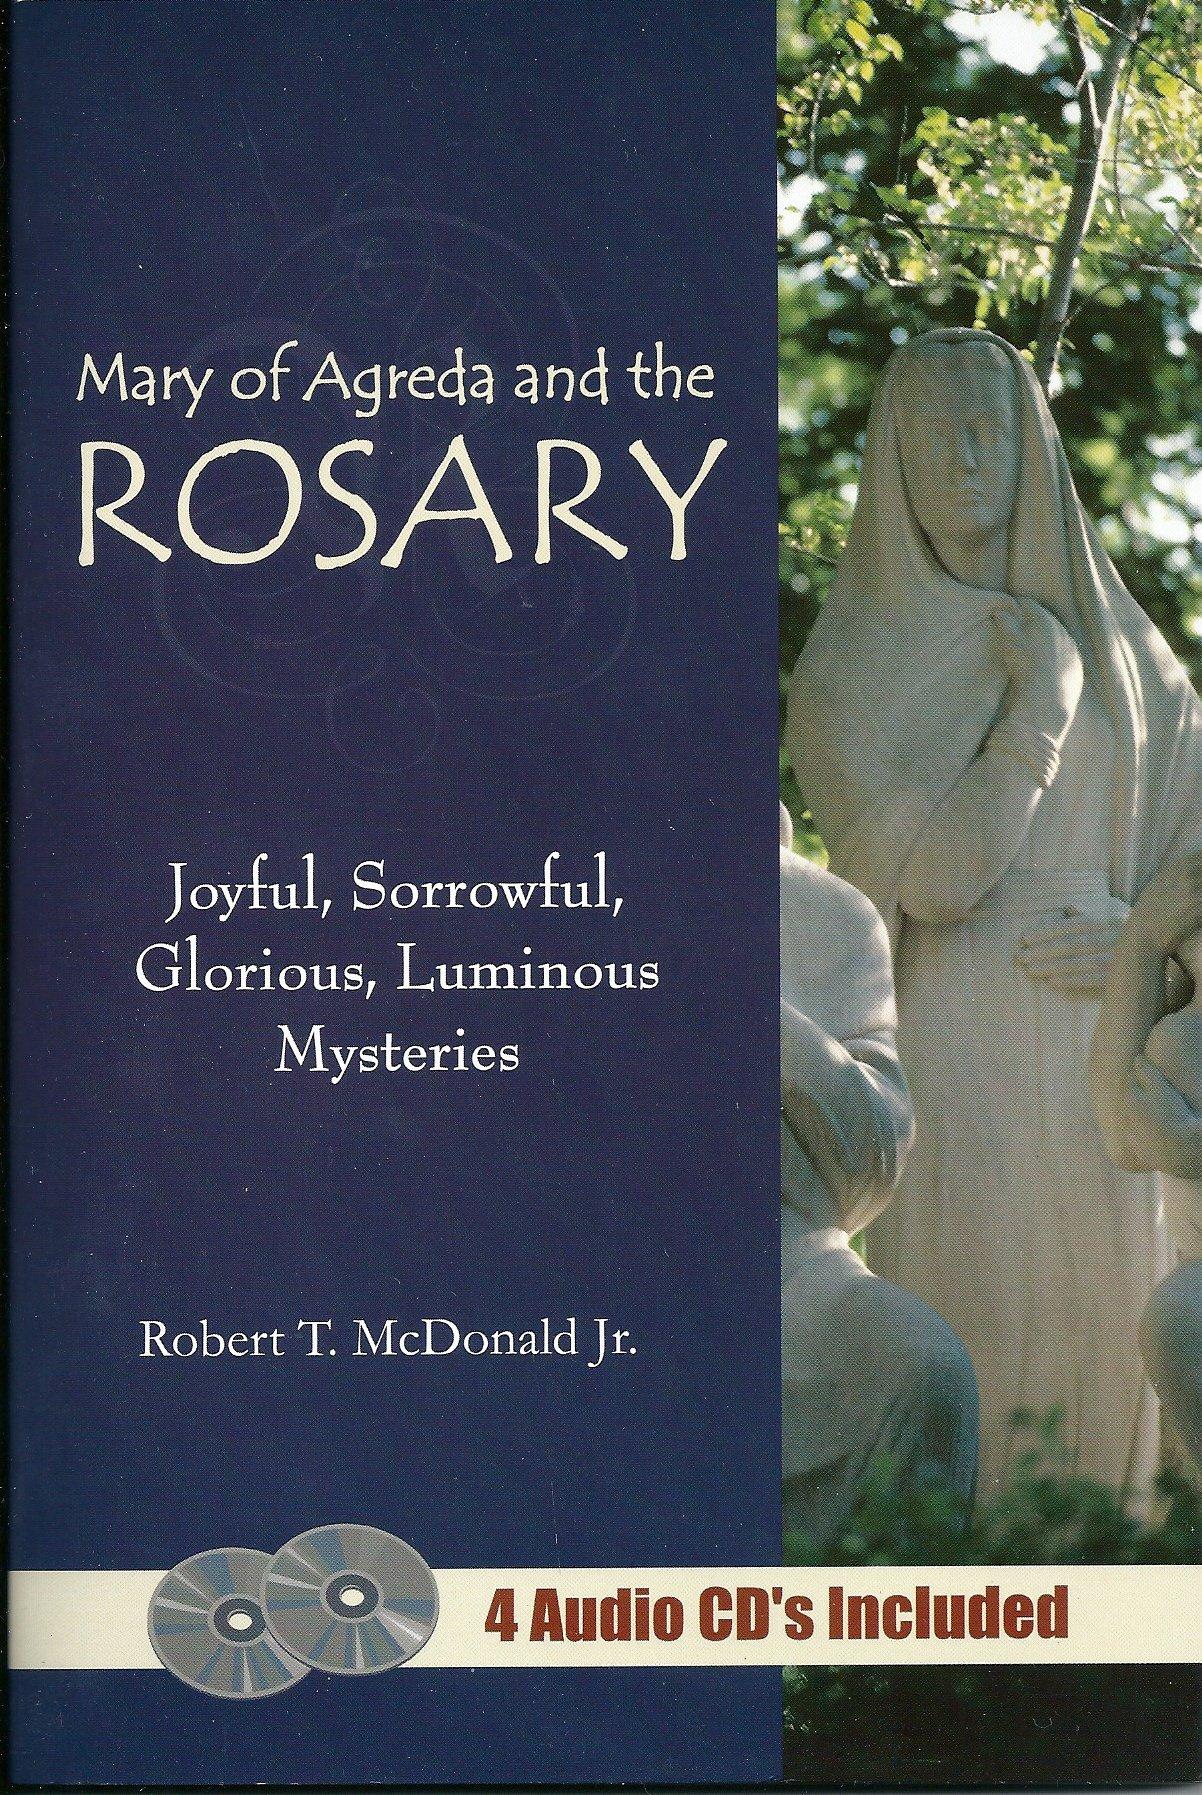 Mary of Agreda and the Rosary - Joyful, Sorrowful, Glorious, Luminous Mysteries (4 Audio CDs Included) pdf epub